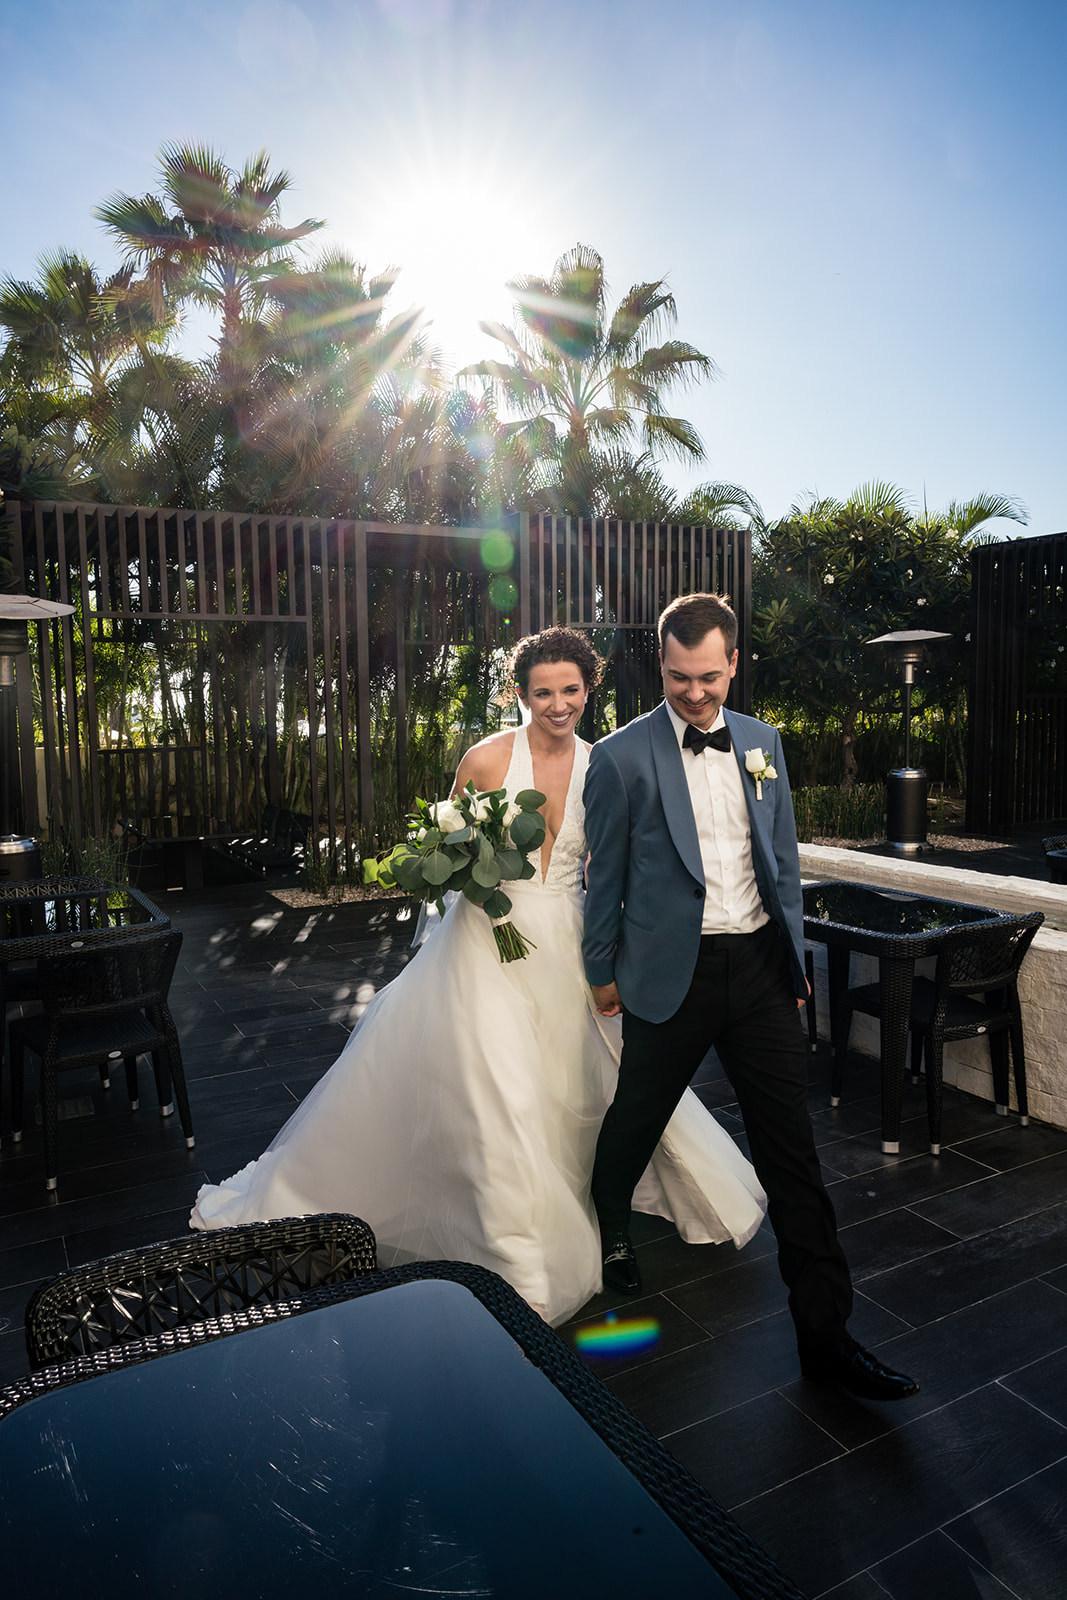 Destination Wedding #kpbride